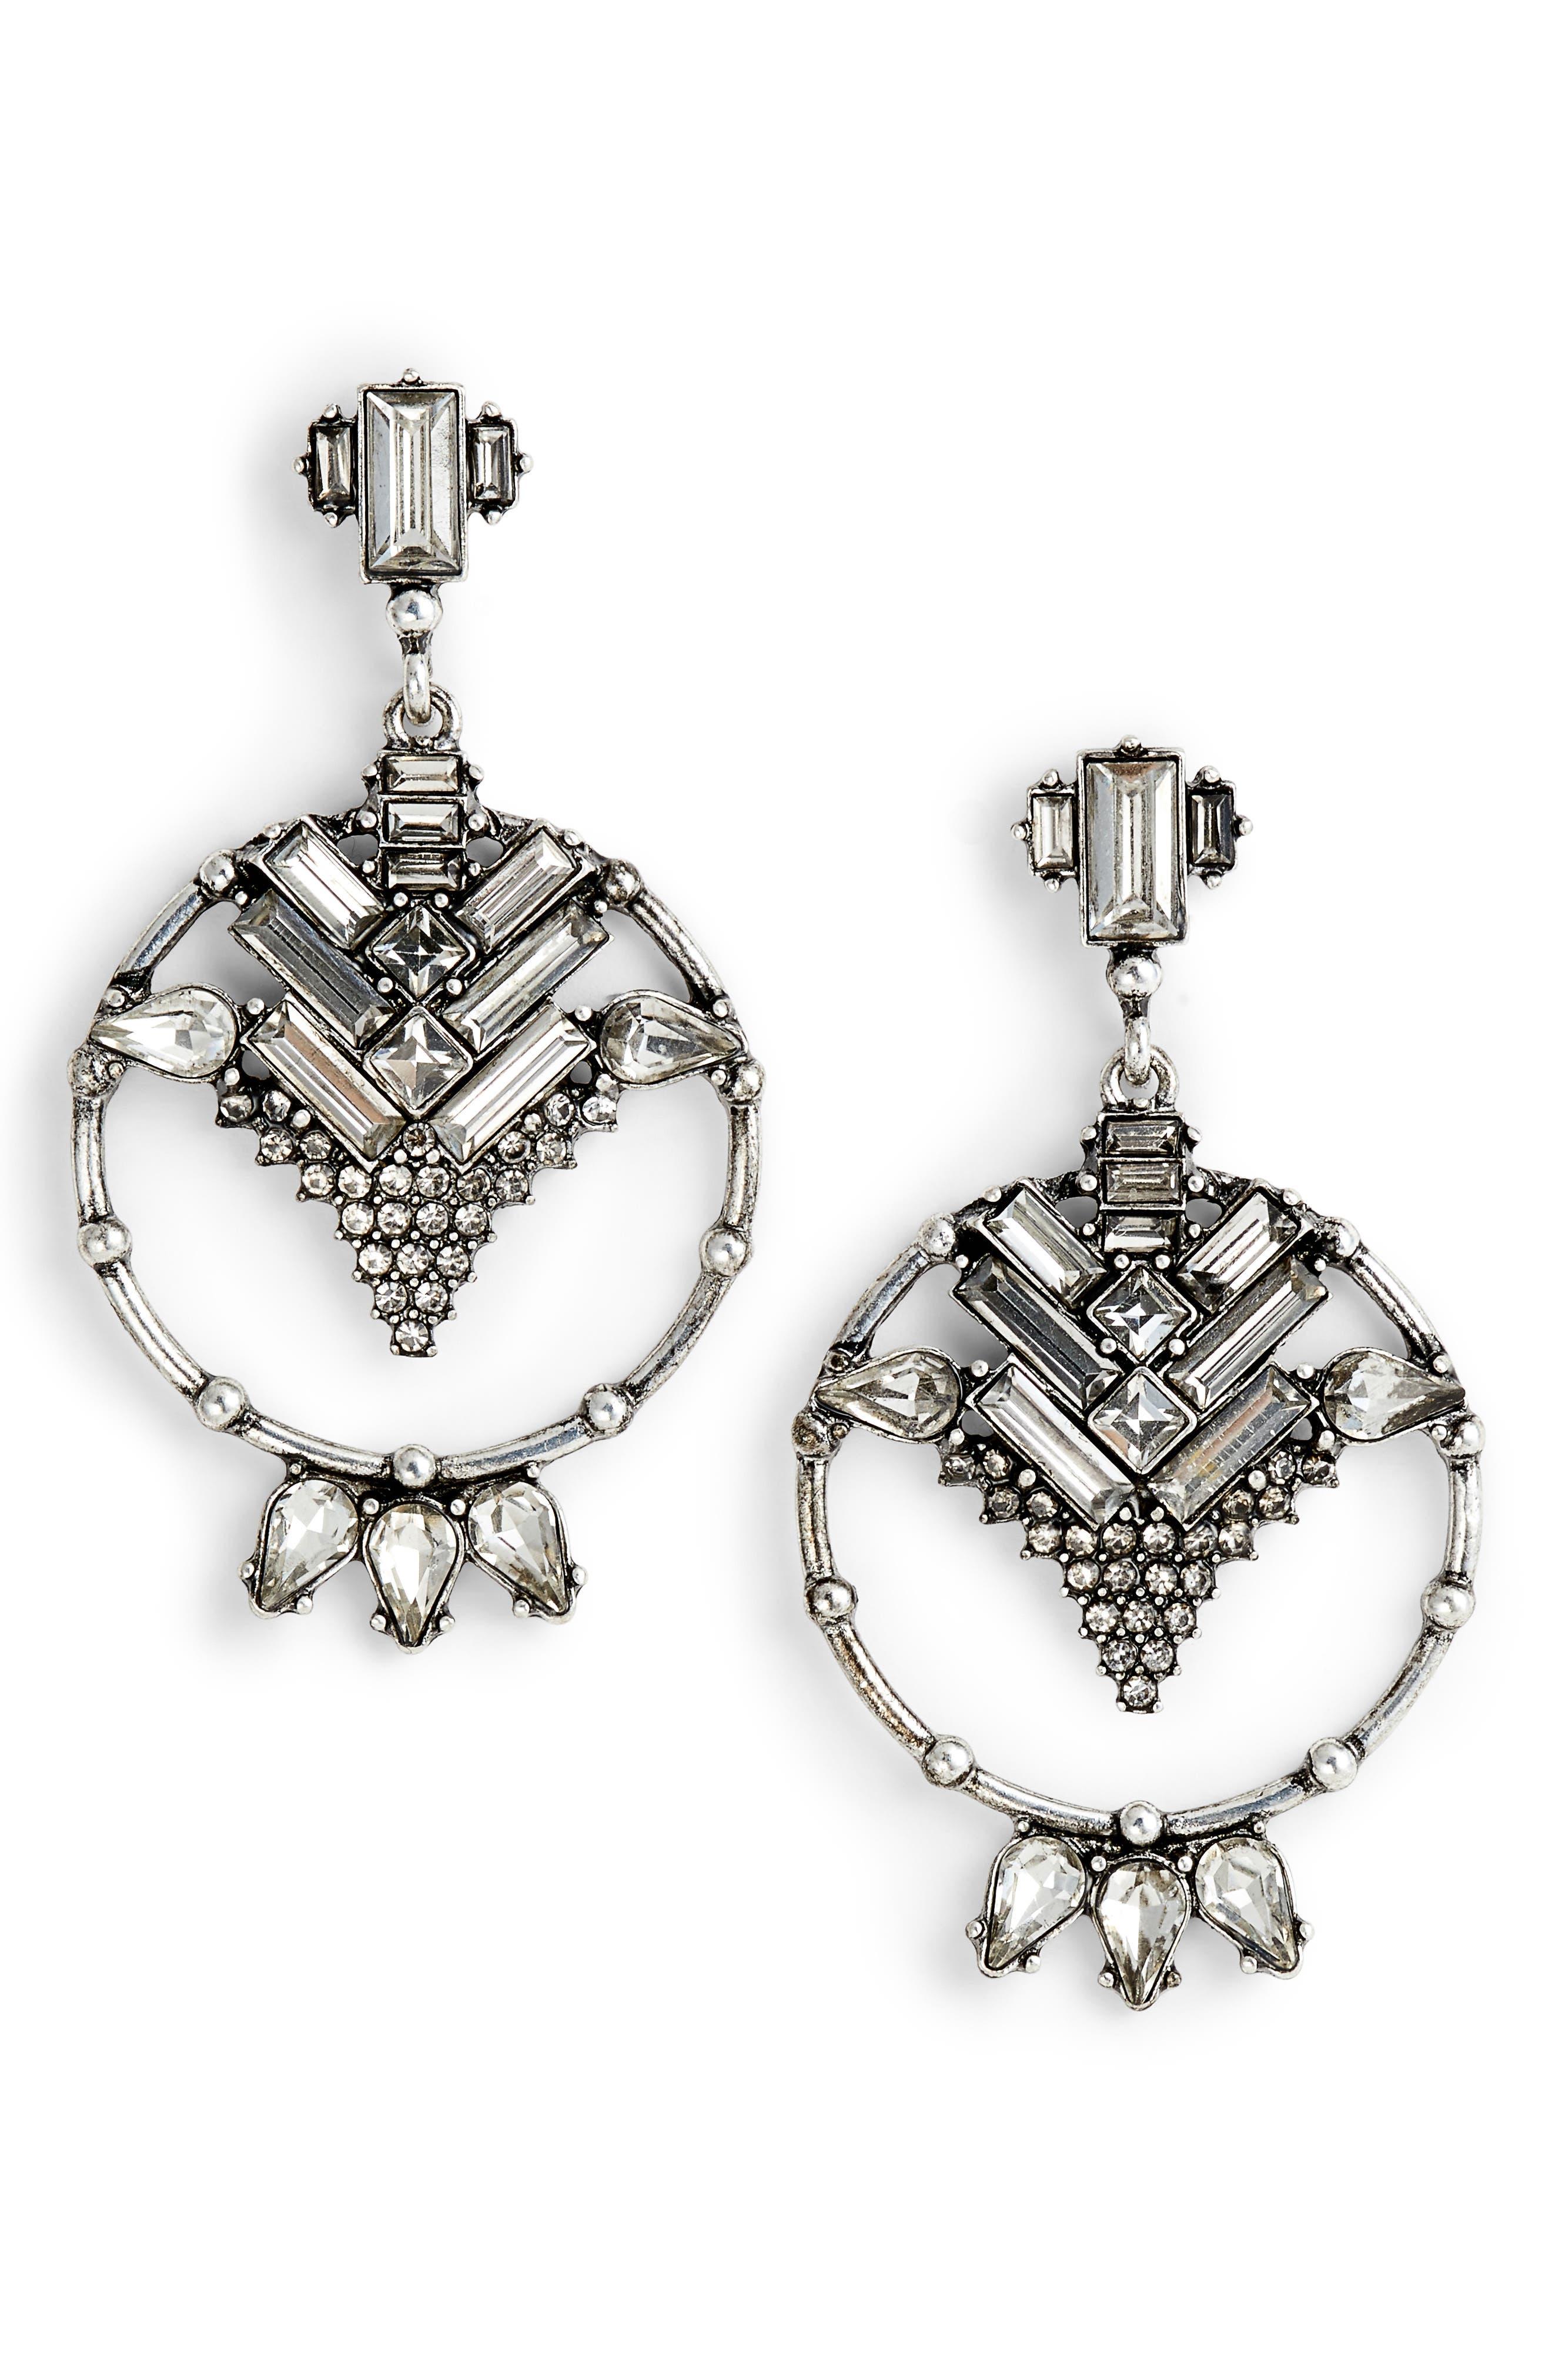 DLNLX BY DYLANLEX Crystal Drop Earrings